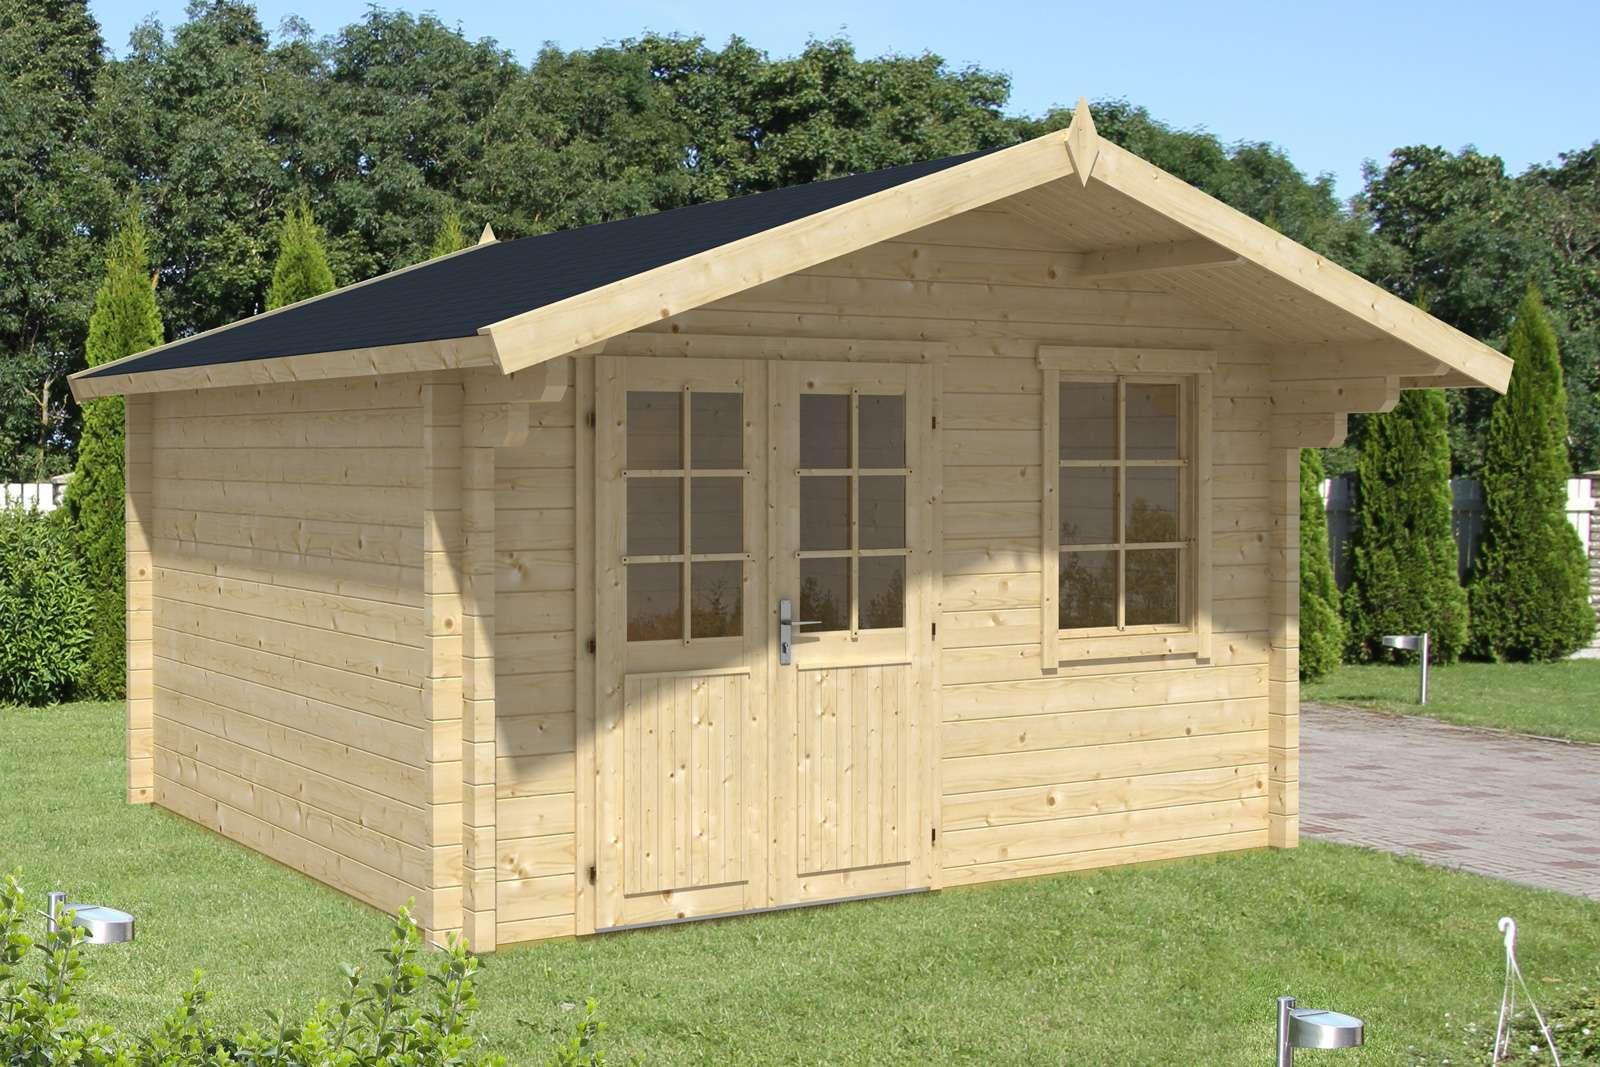 gartenhaus 70 mm wandst rke my blog. Black Bedroom Furniture Sets. Home Design Ideas